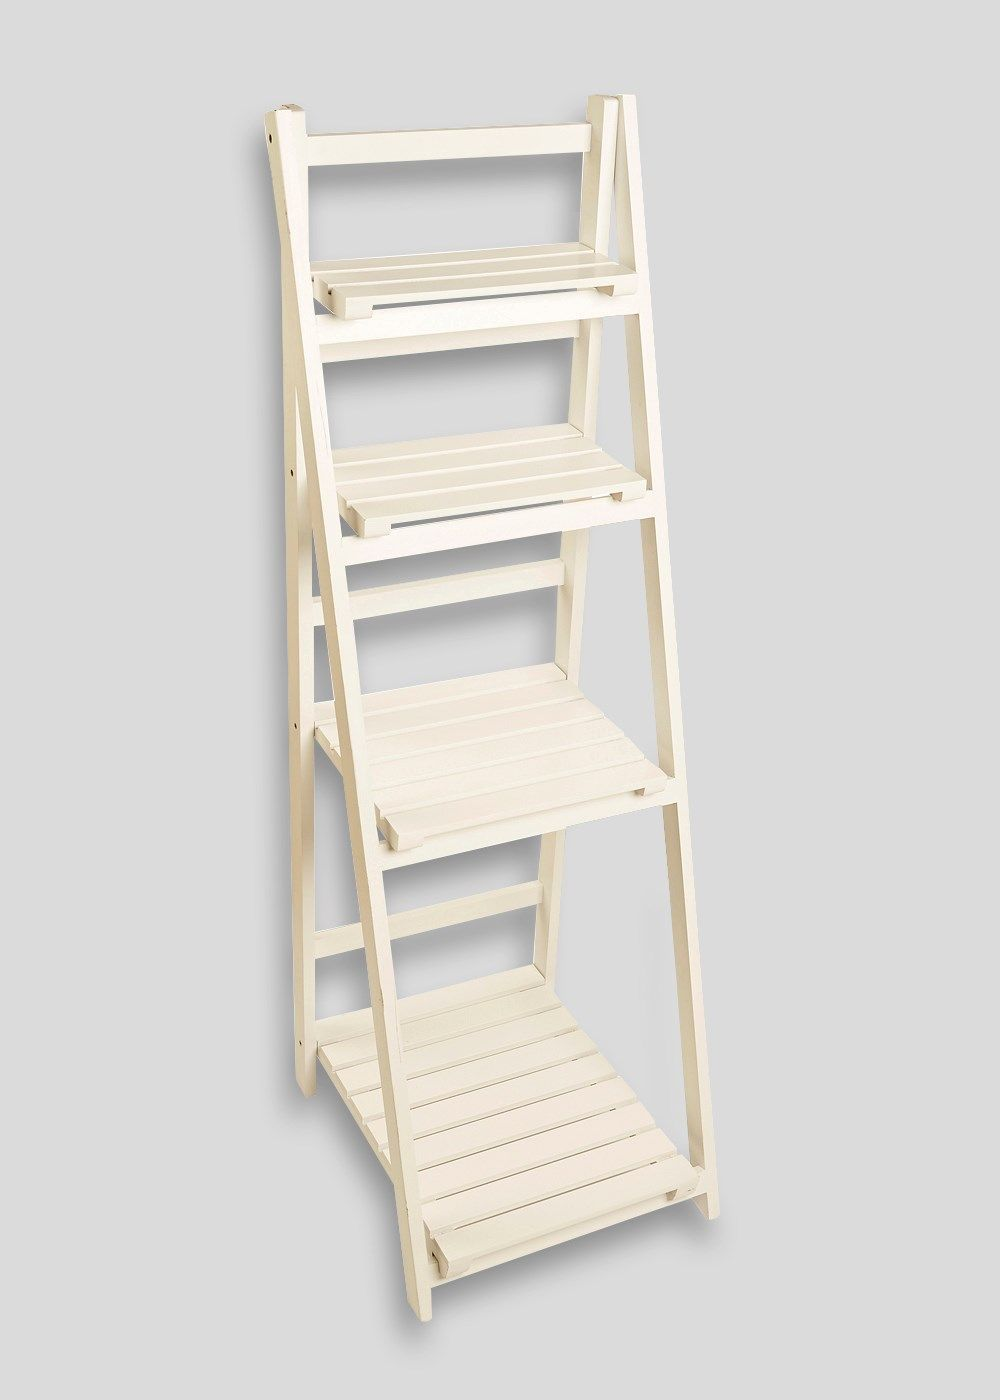 Slatted Bathroom Shelving Ladder Unit (125cm X 45cm X 40cm)